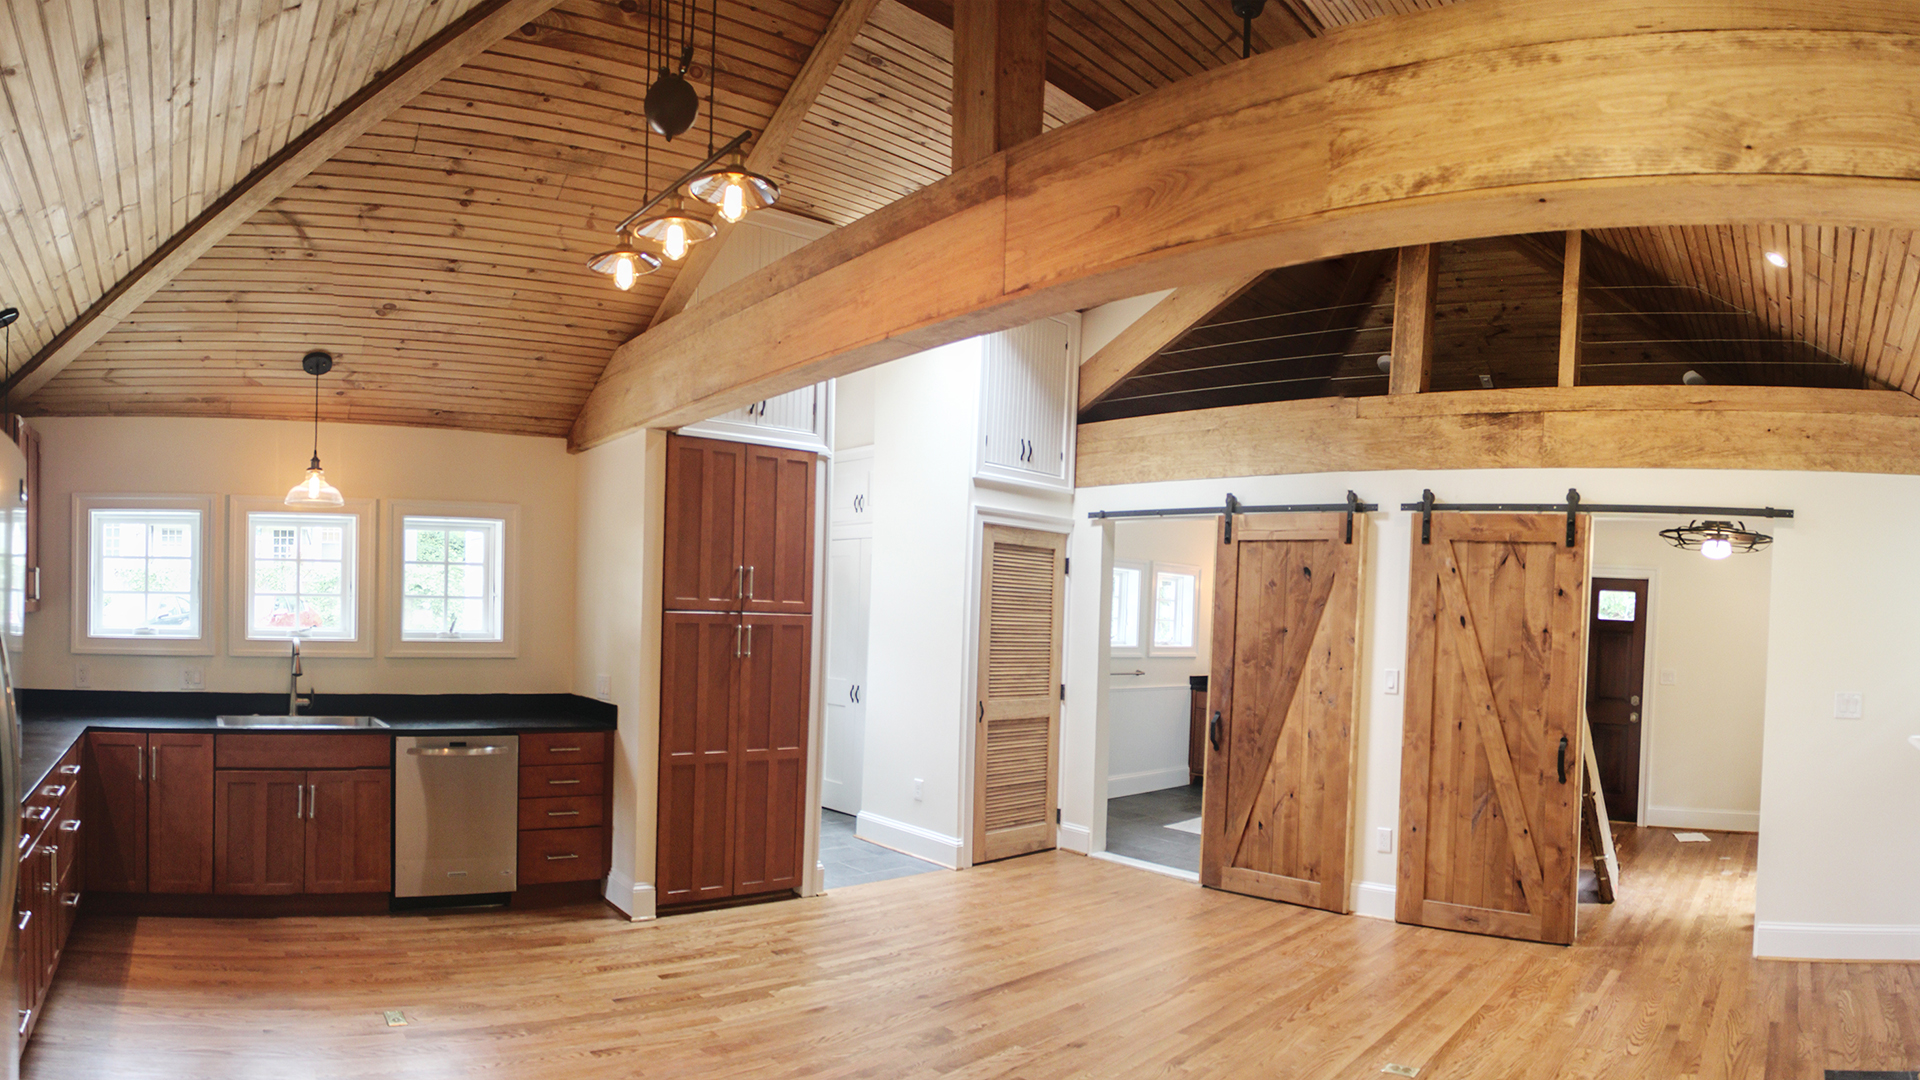 Home Renovation Ideas Exposed Joist